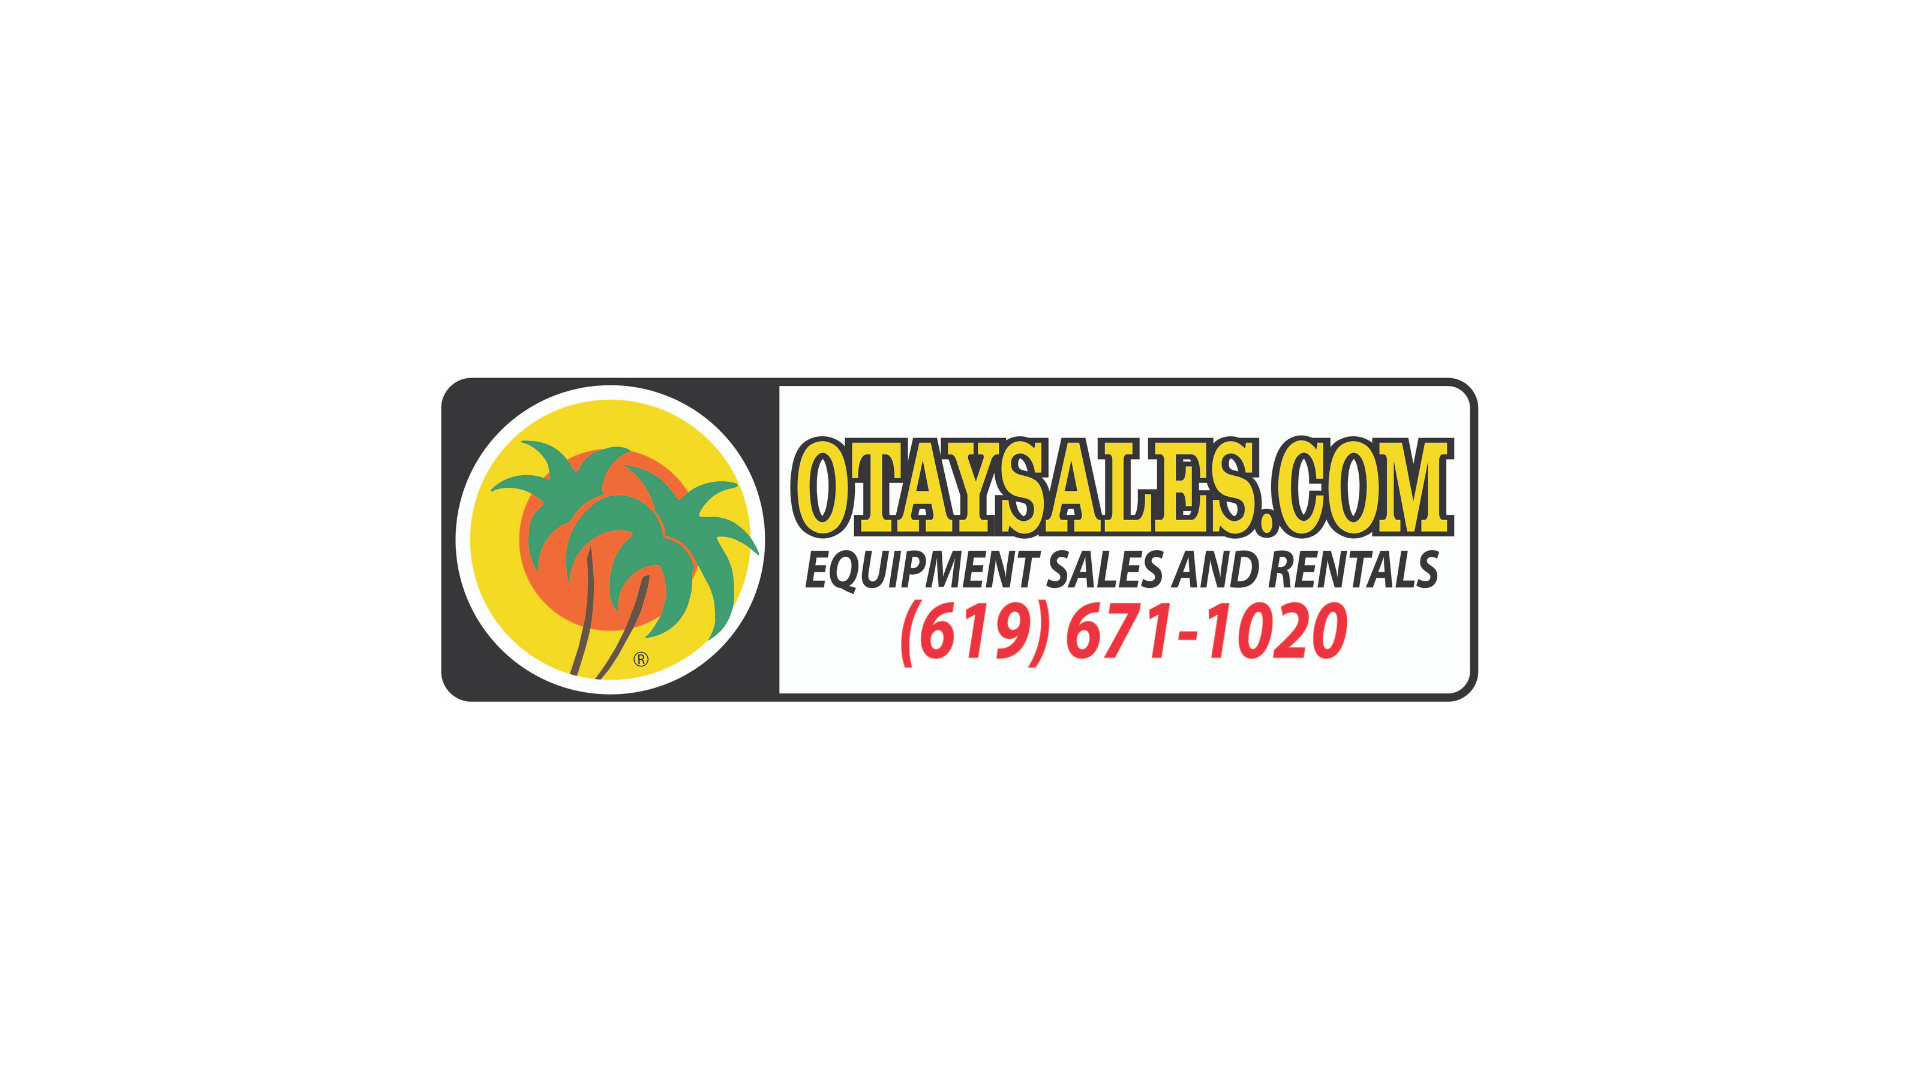 http://www.otaysales.com/